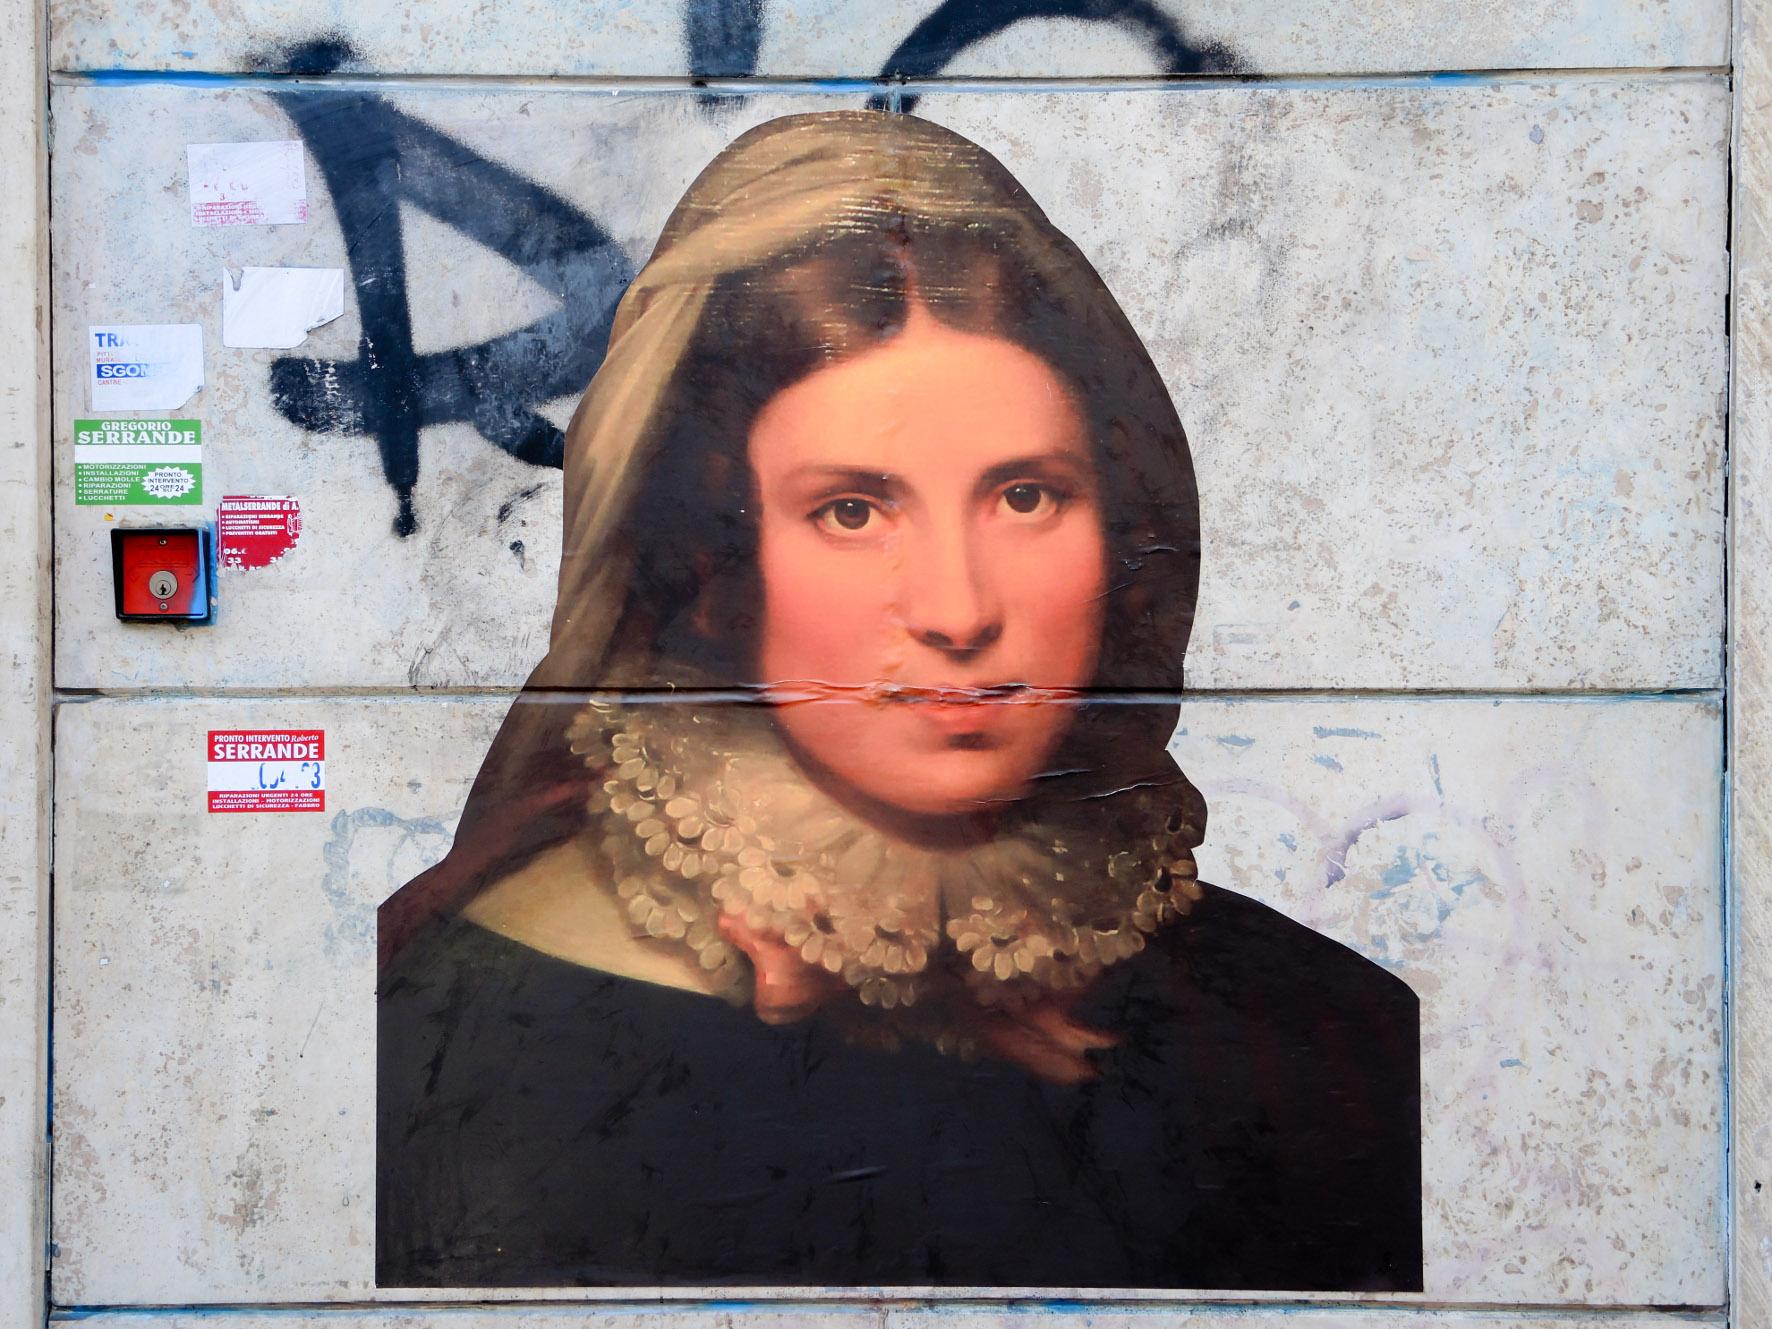 7Roma. San Paolo. Outings-Project. Portrait of Elena Battistini, unknown...-1.jp